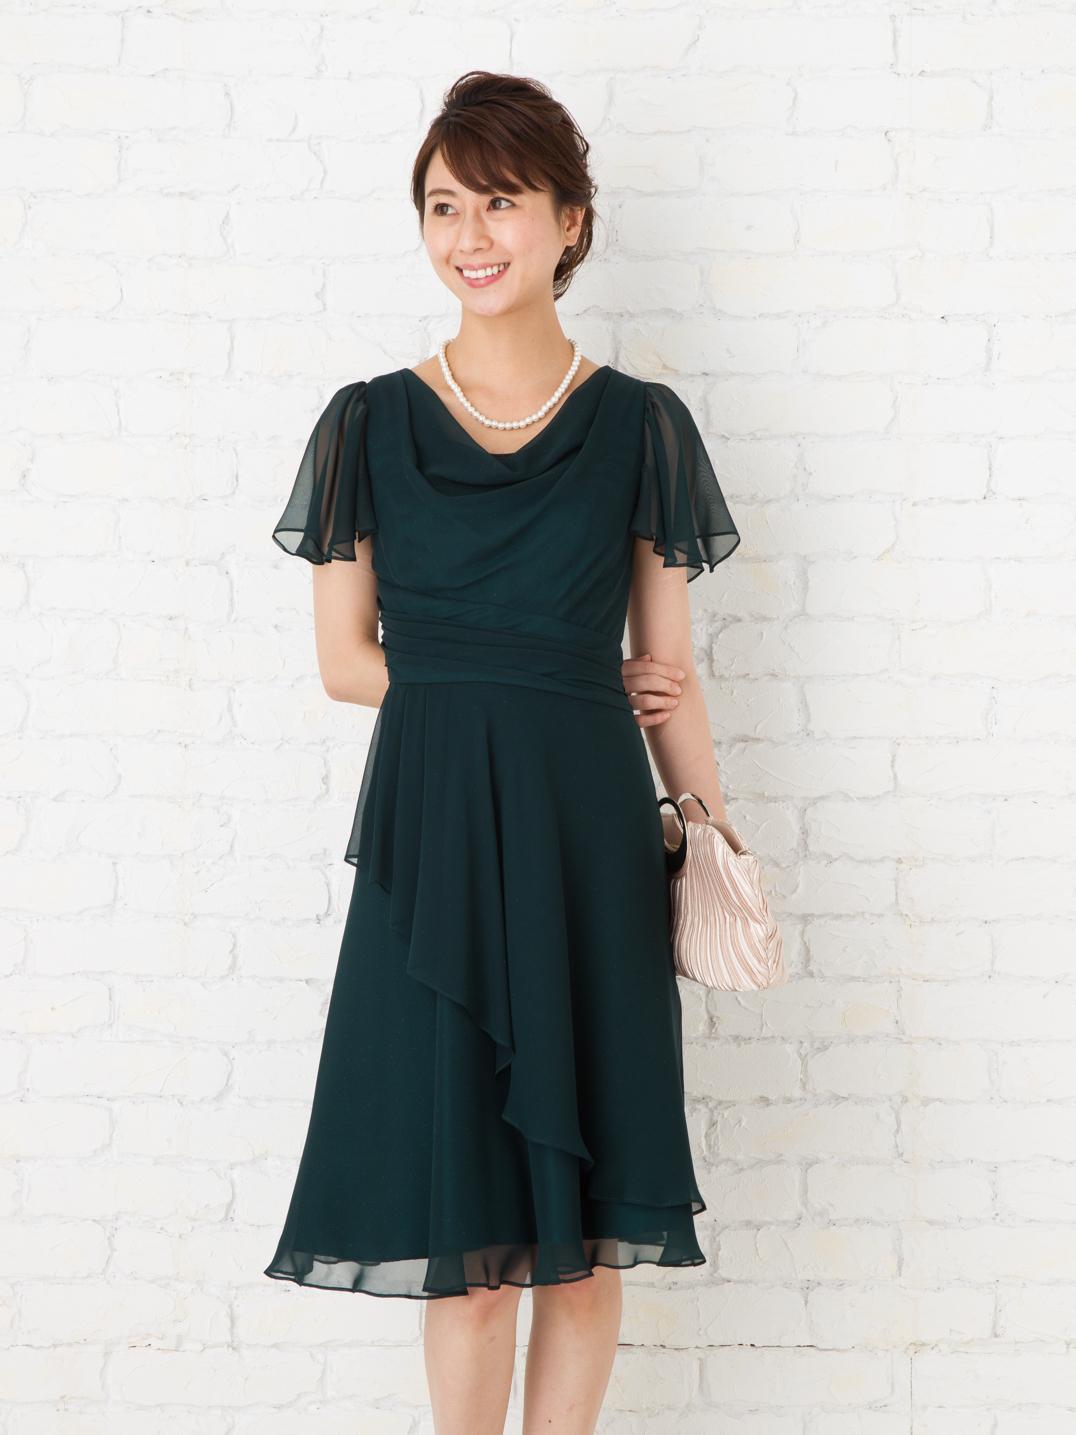 PREFERENCE PARTY'S ドレス / Mサイズ (DOC0036)